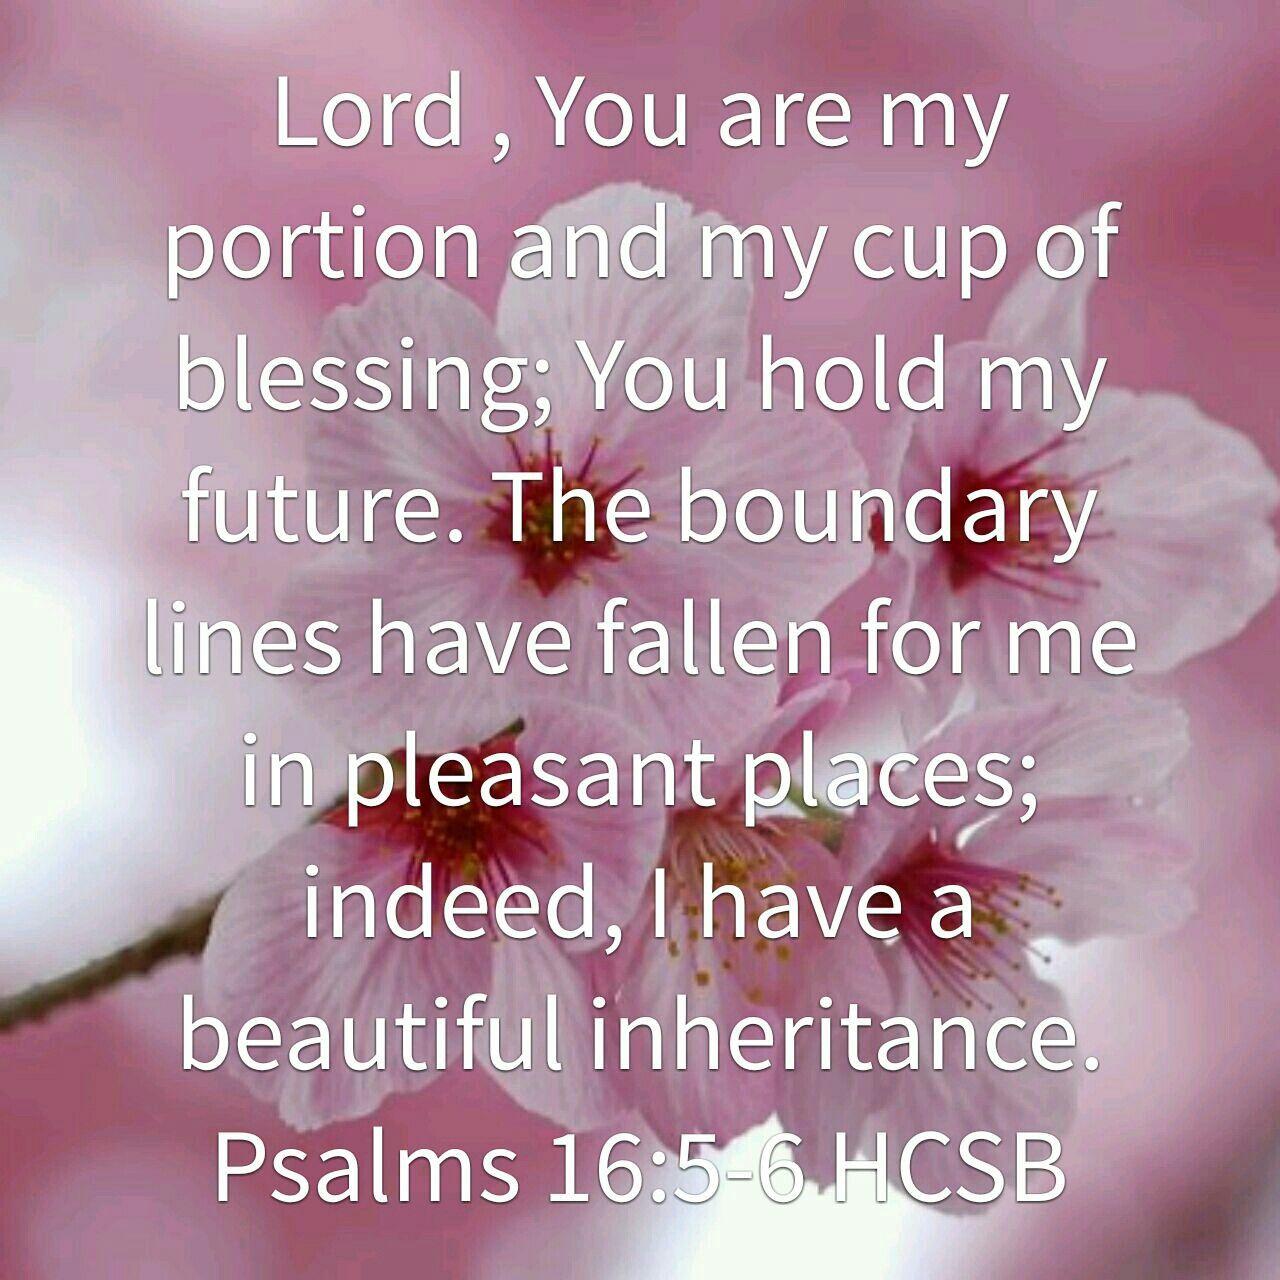 Psalm 16:5-6 HCSB | Psalms verses, Words of wisdom quotes, Psalms